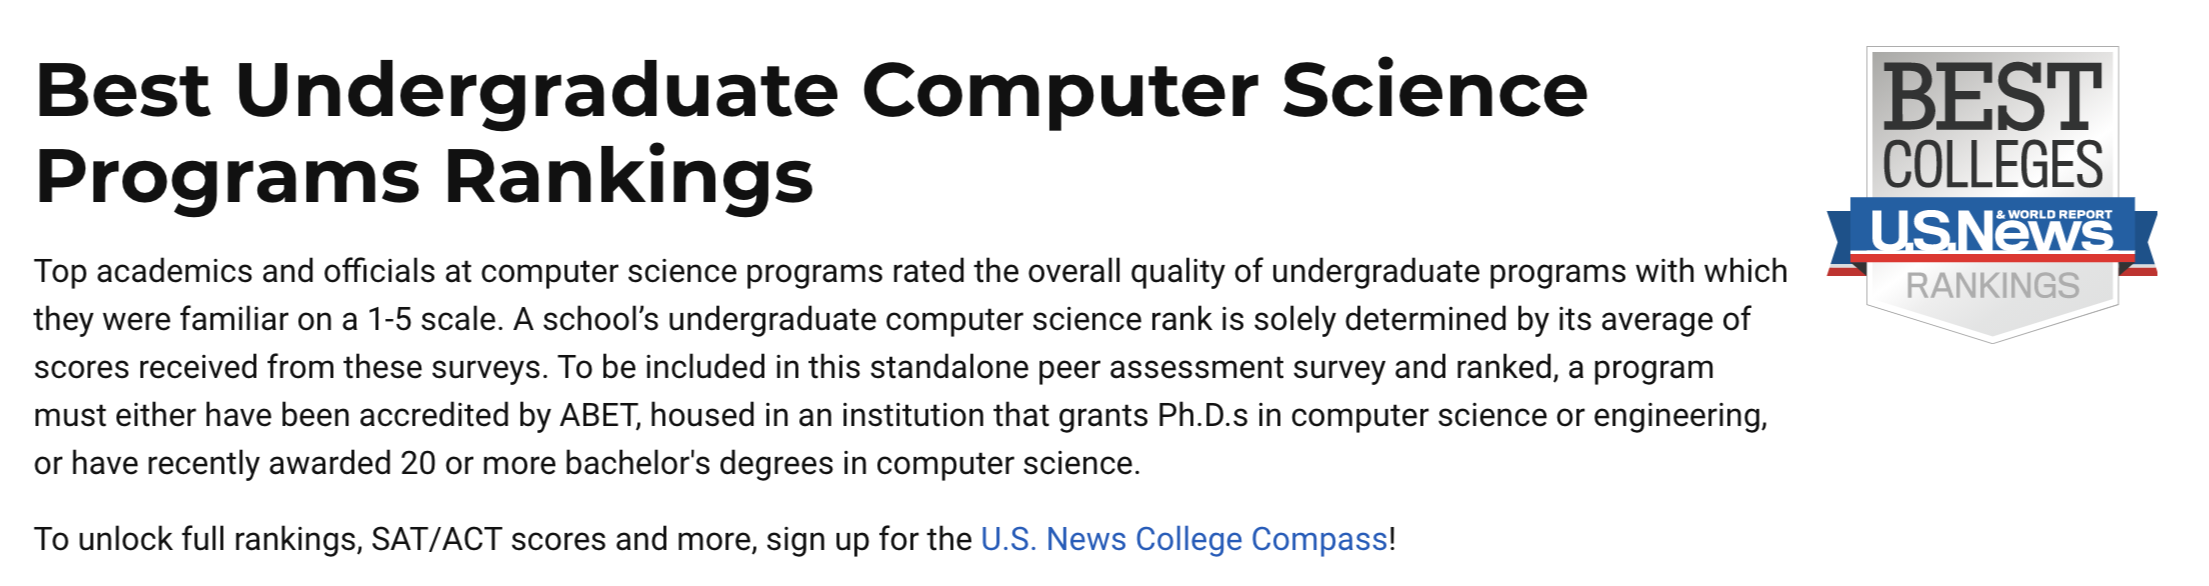 2021U.S.News 首次发布美国本科大学计算机专业排名!-计算机专业最强的美国大学TOP10